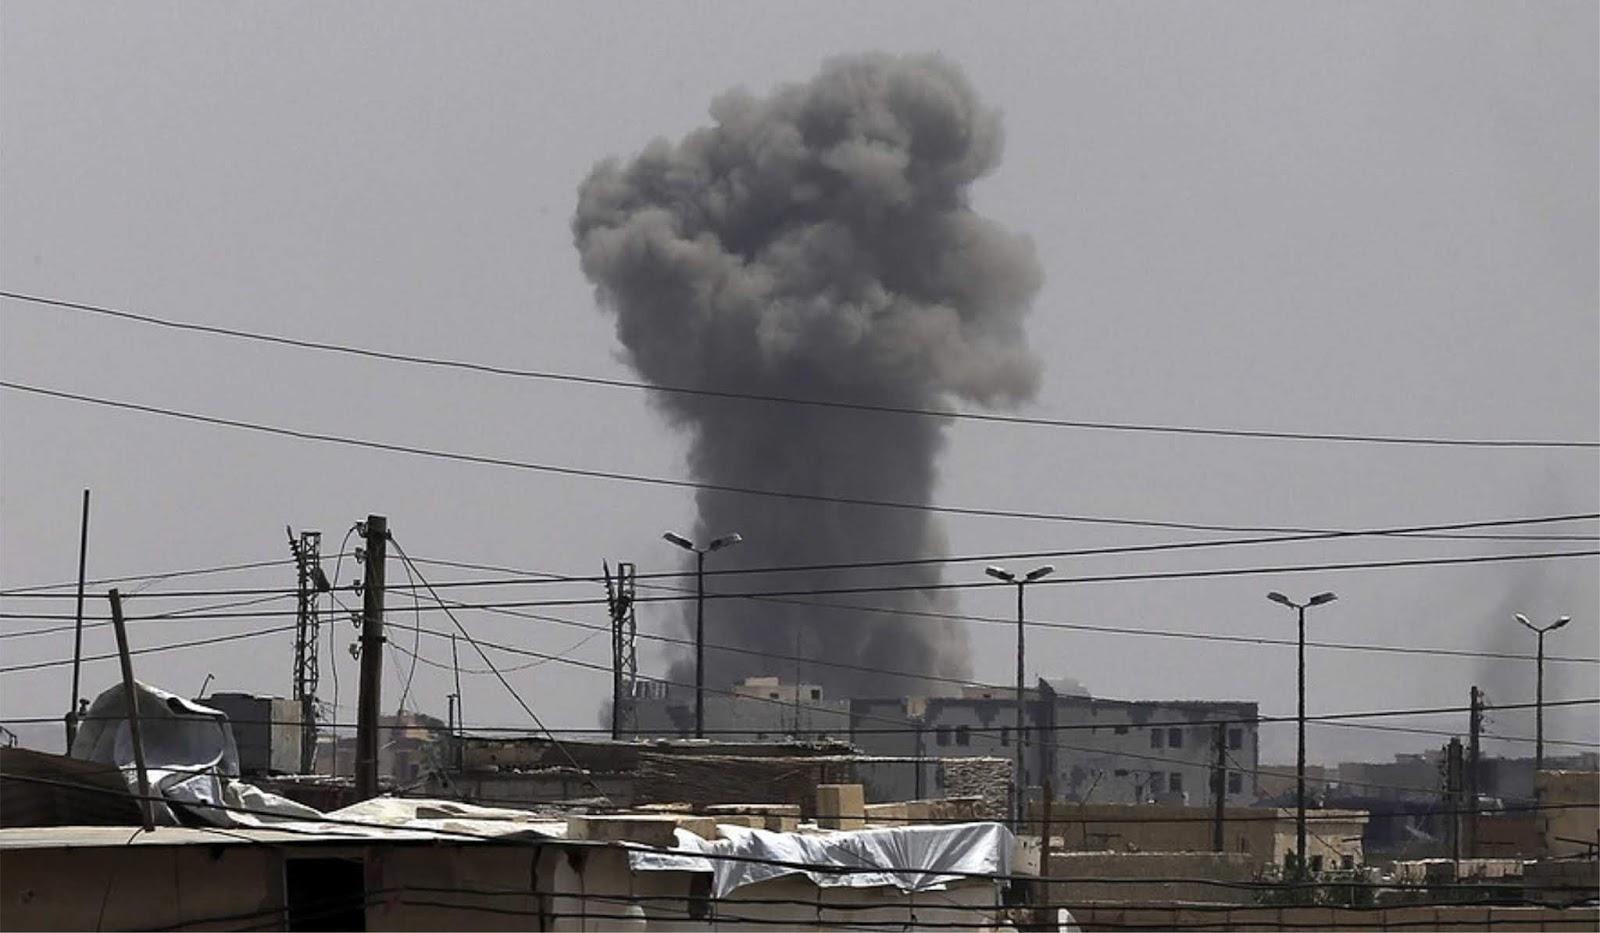 15 warga Suriah tewas dalam serangan pasukan koalisi yang dipimpin Amerika Serikat di kota Hajin